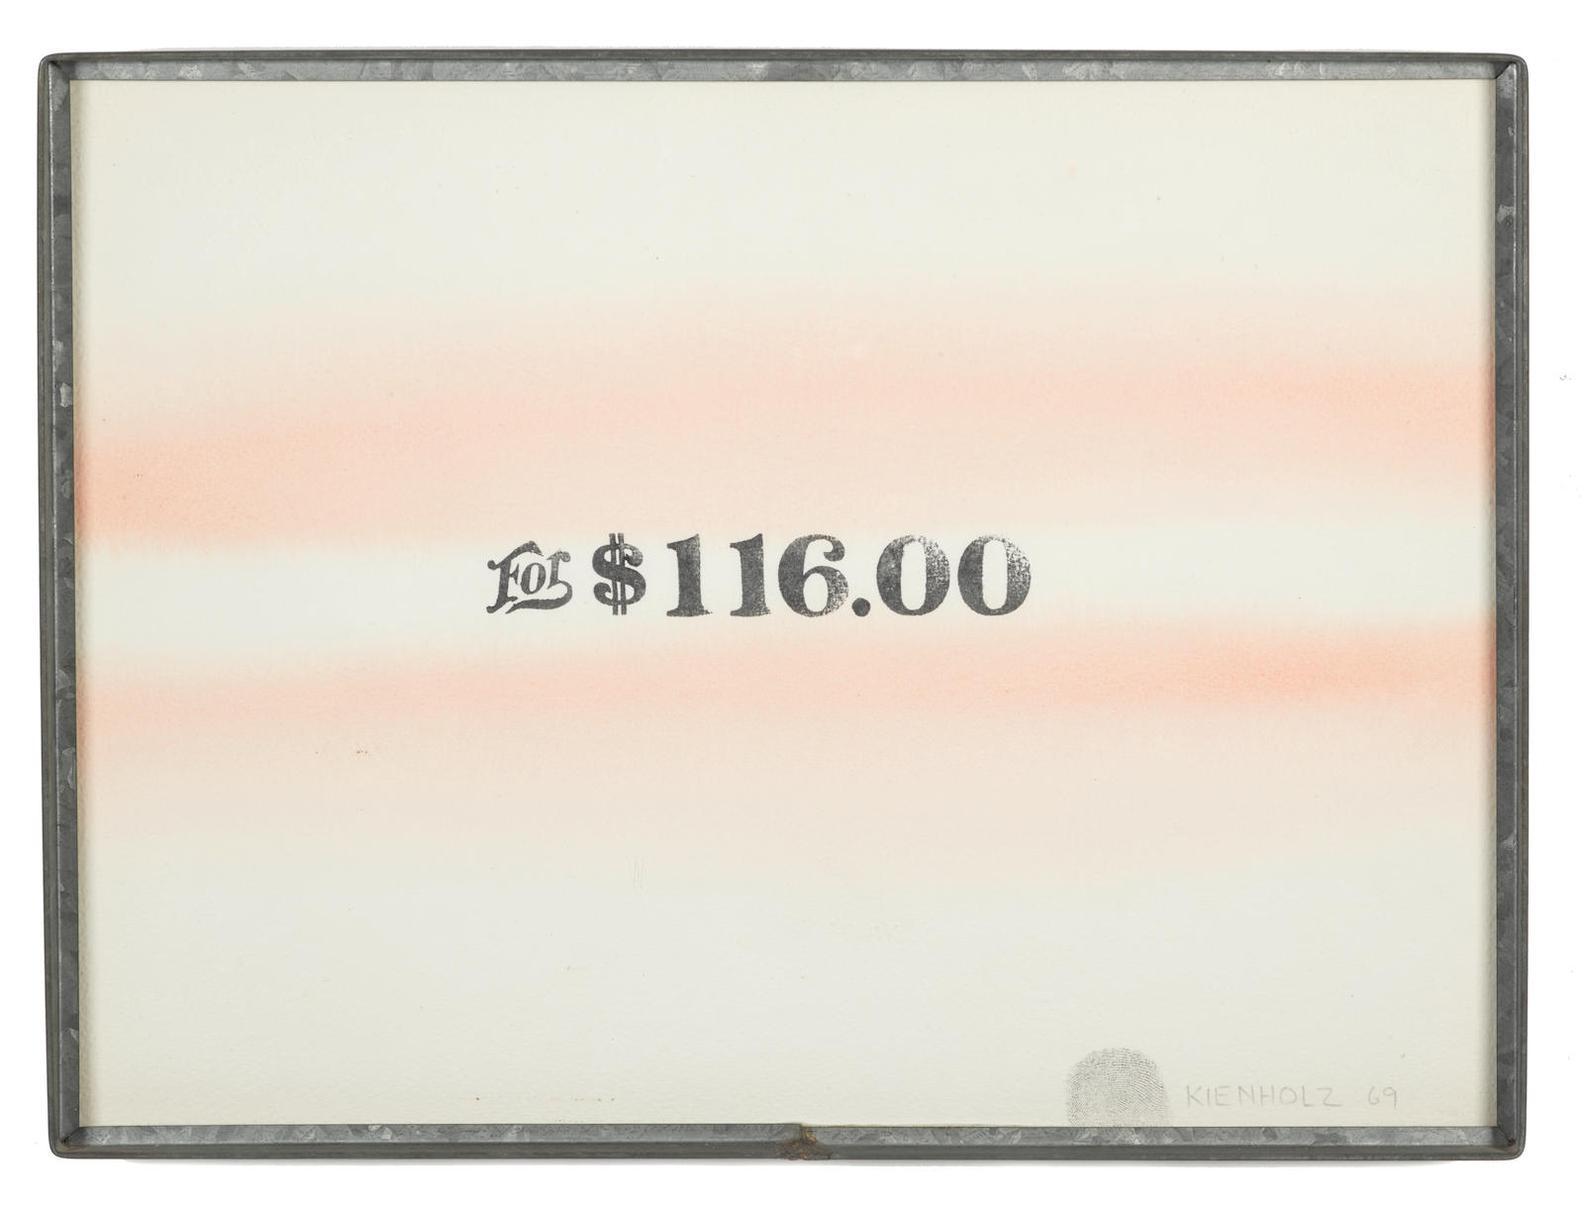 Edward Kienholz-For $116.00-1969